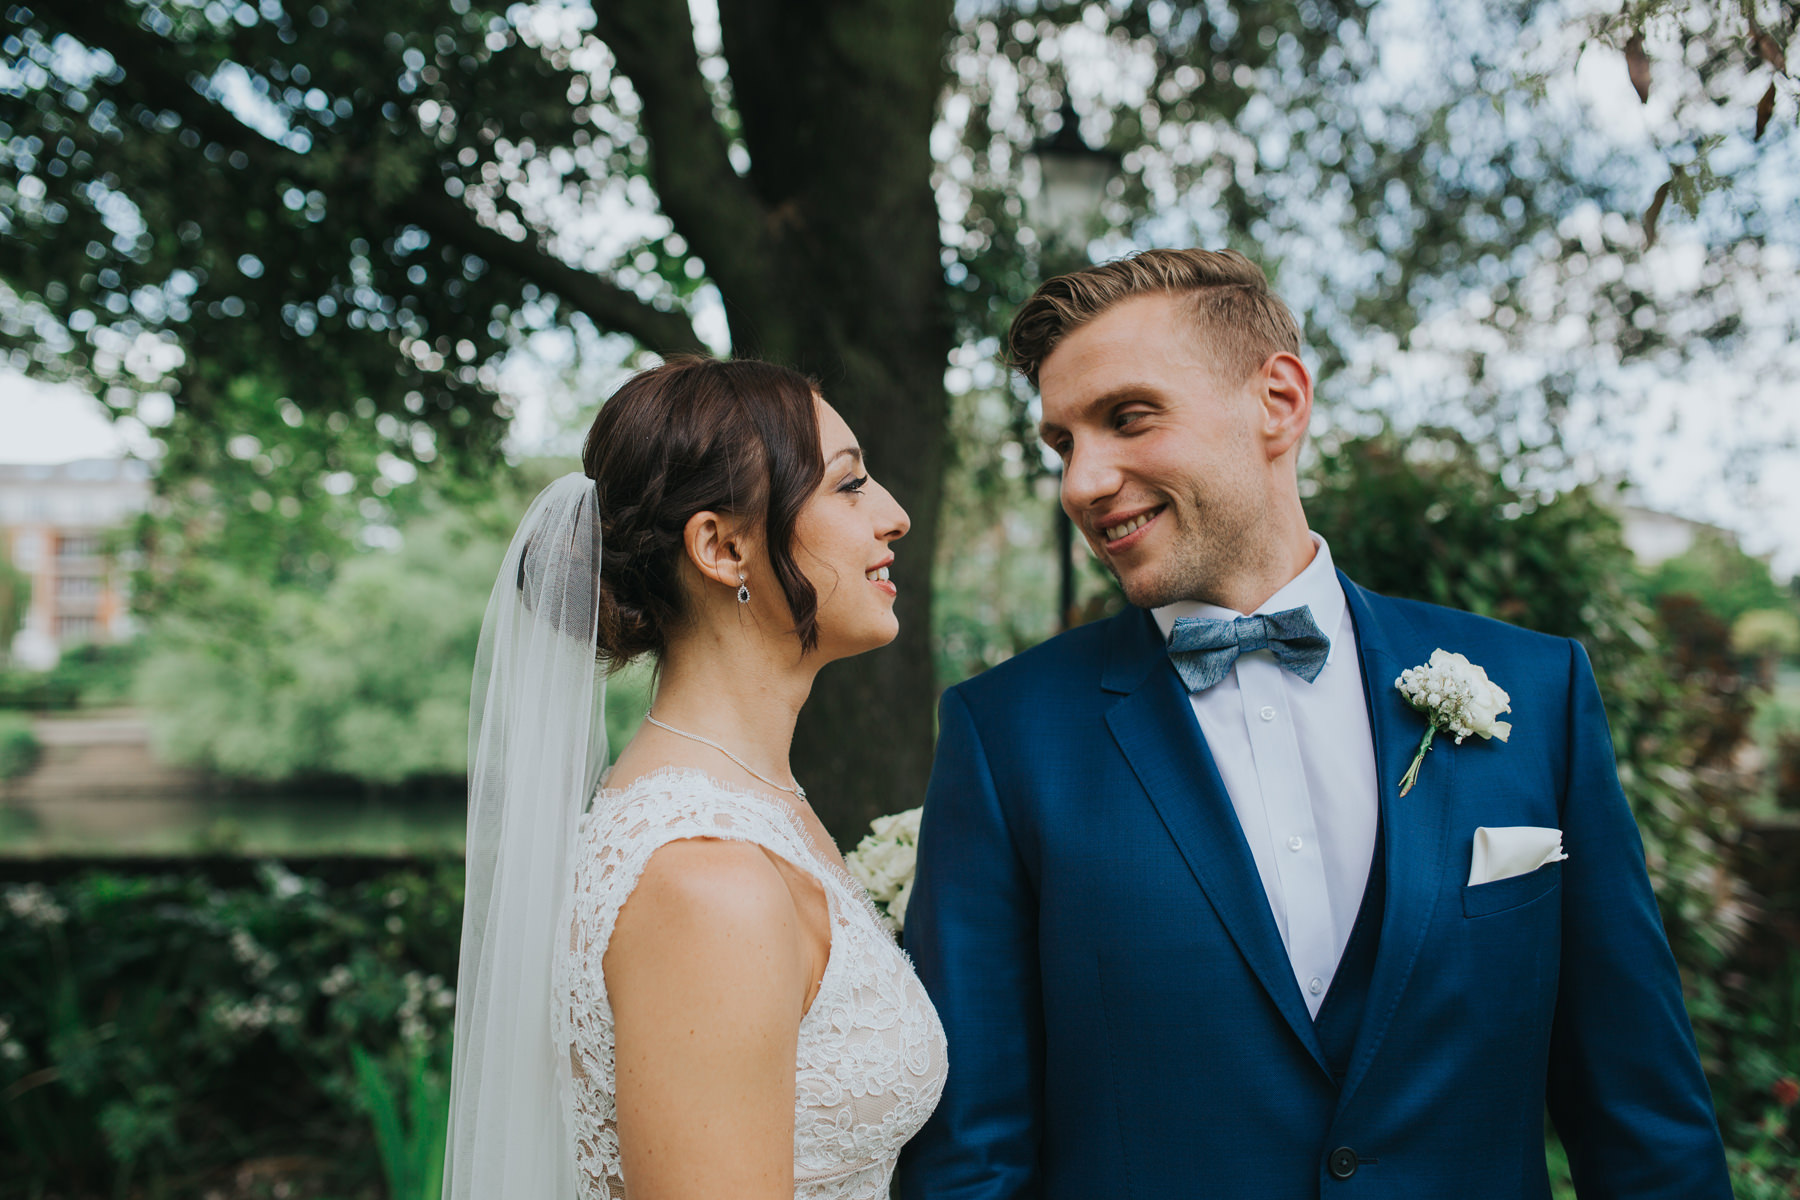 CRL-326-The Bingham wedding Richmond-Claire Rob bridal couple portraits.jpg